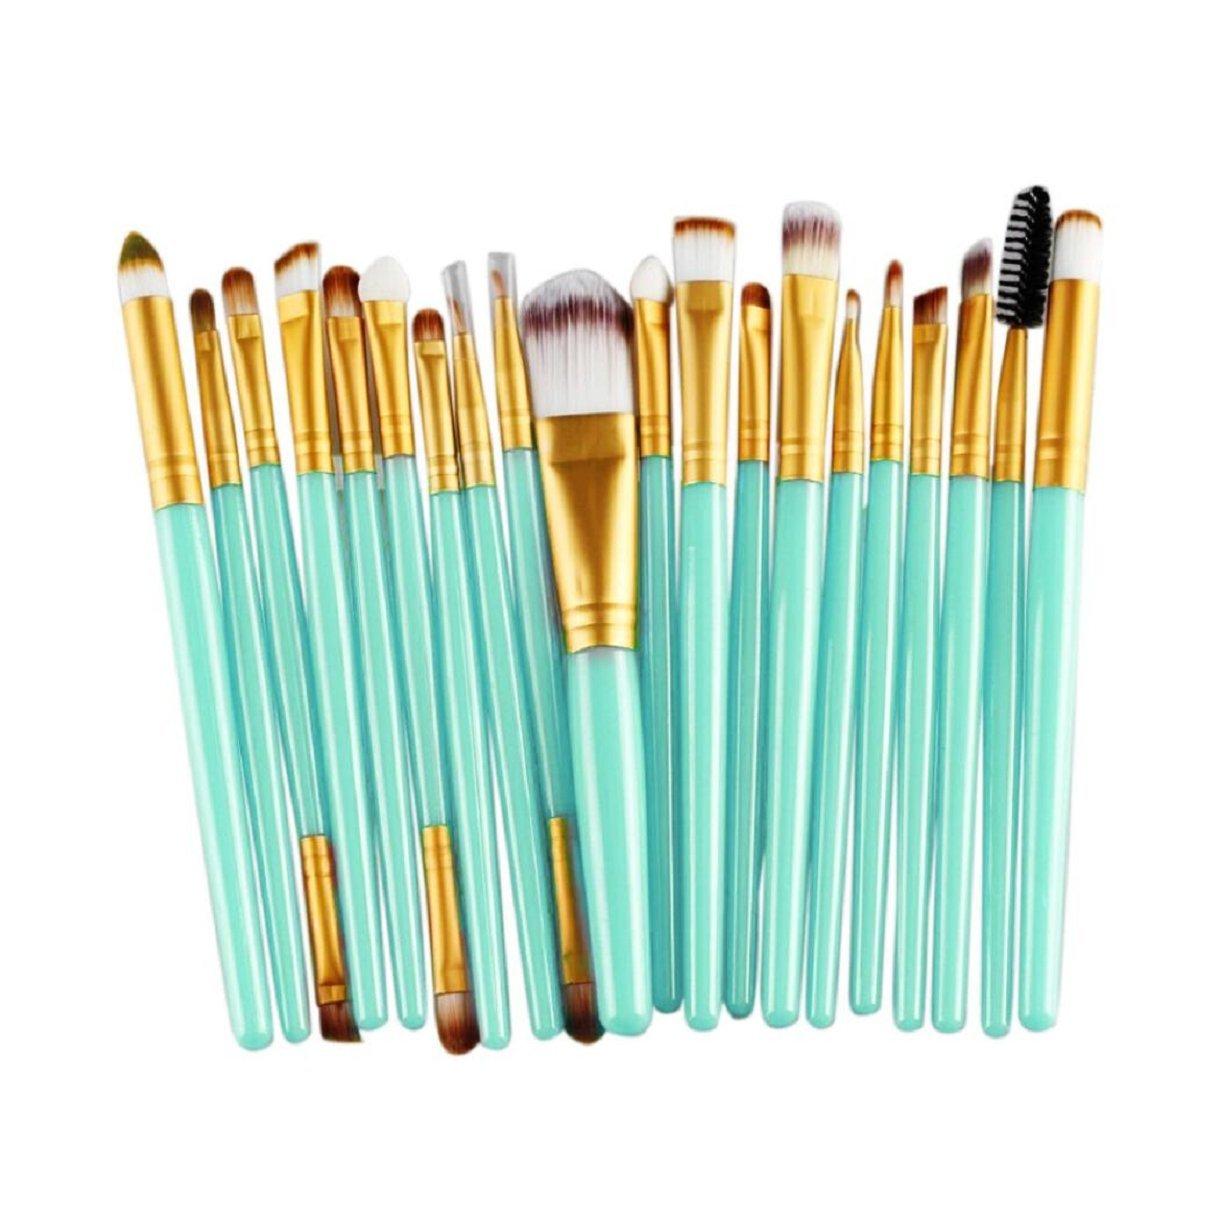 Lookatool 20 pcs set Makeup Brush Kit Mail order tools Toiletry Set Popular brand in the world Make-up